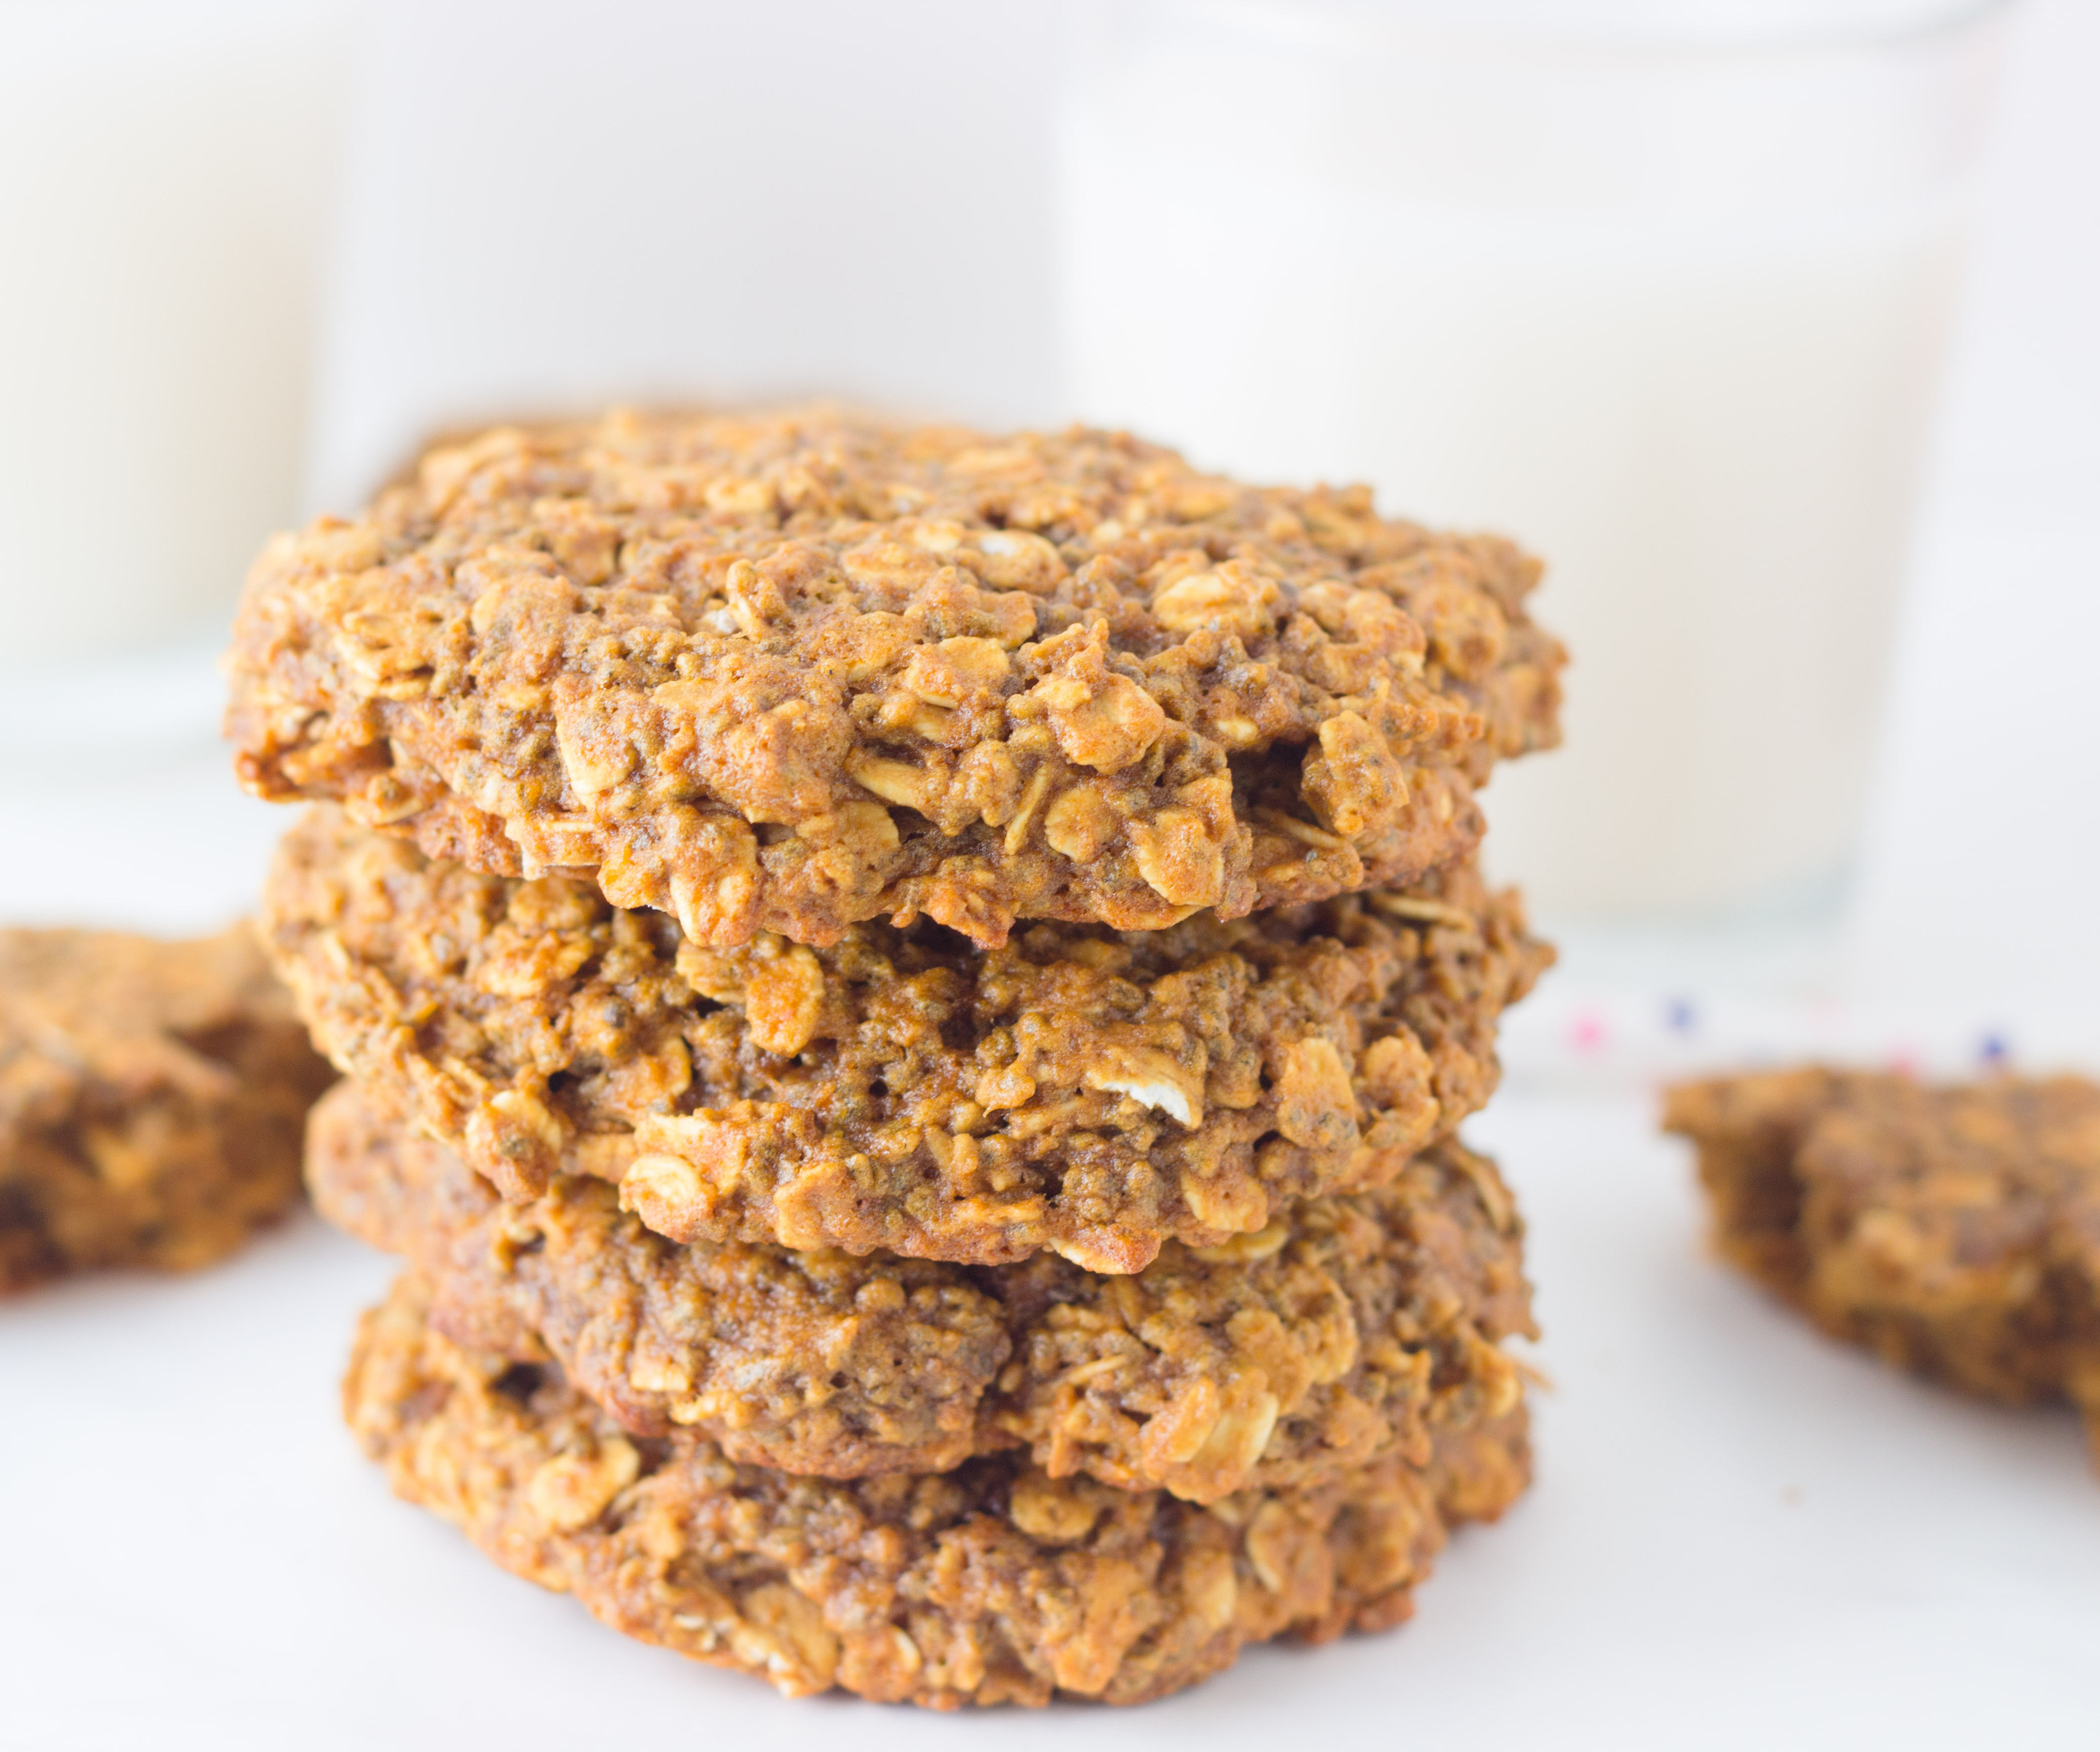 Oatmeal Chia Breakfast Cookies (Vegan and Low fat)